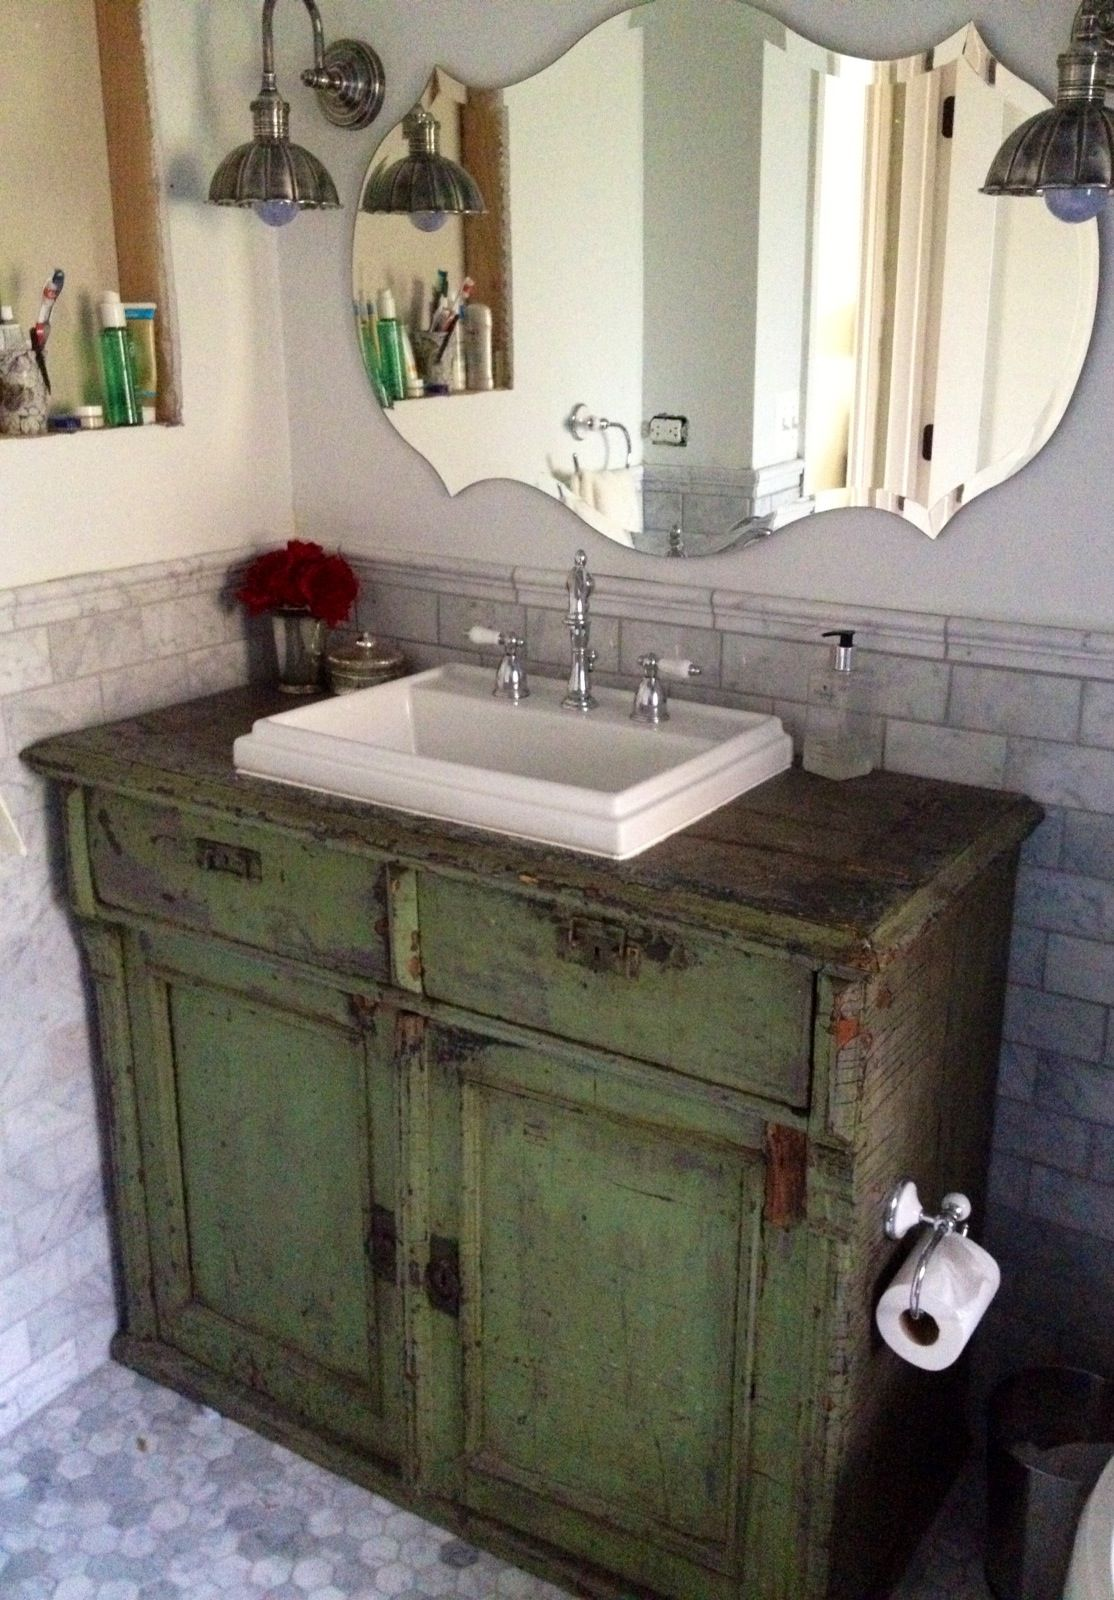 Antique Server Used As A Bathroom Vanity Bathroom